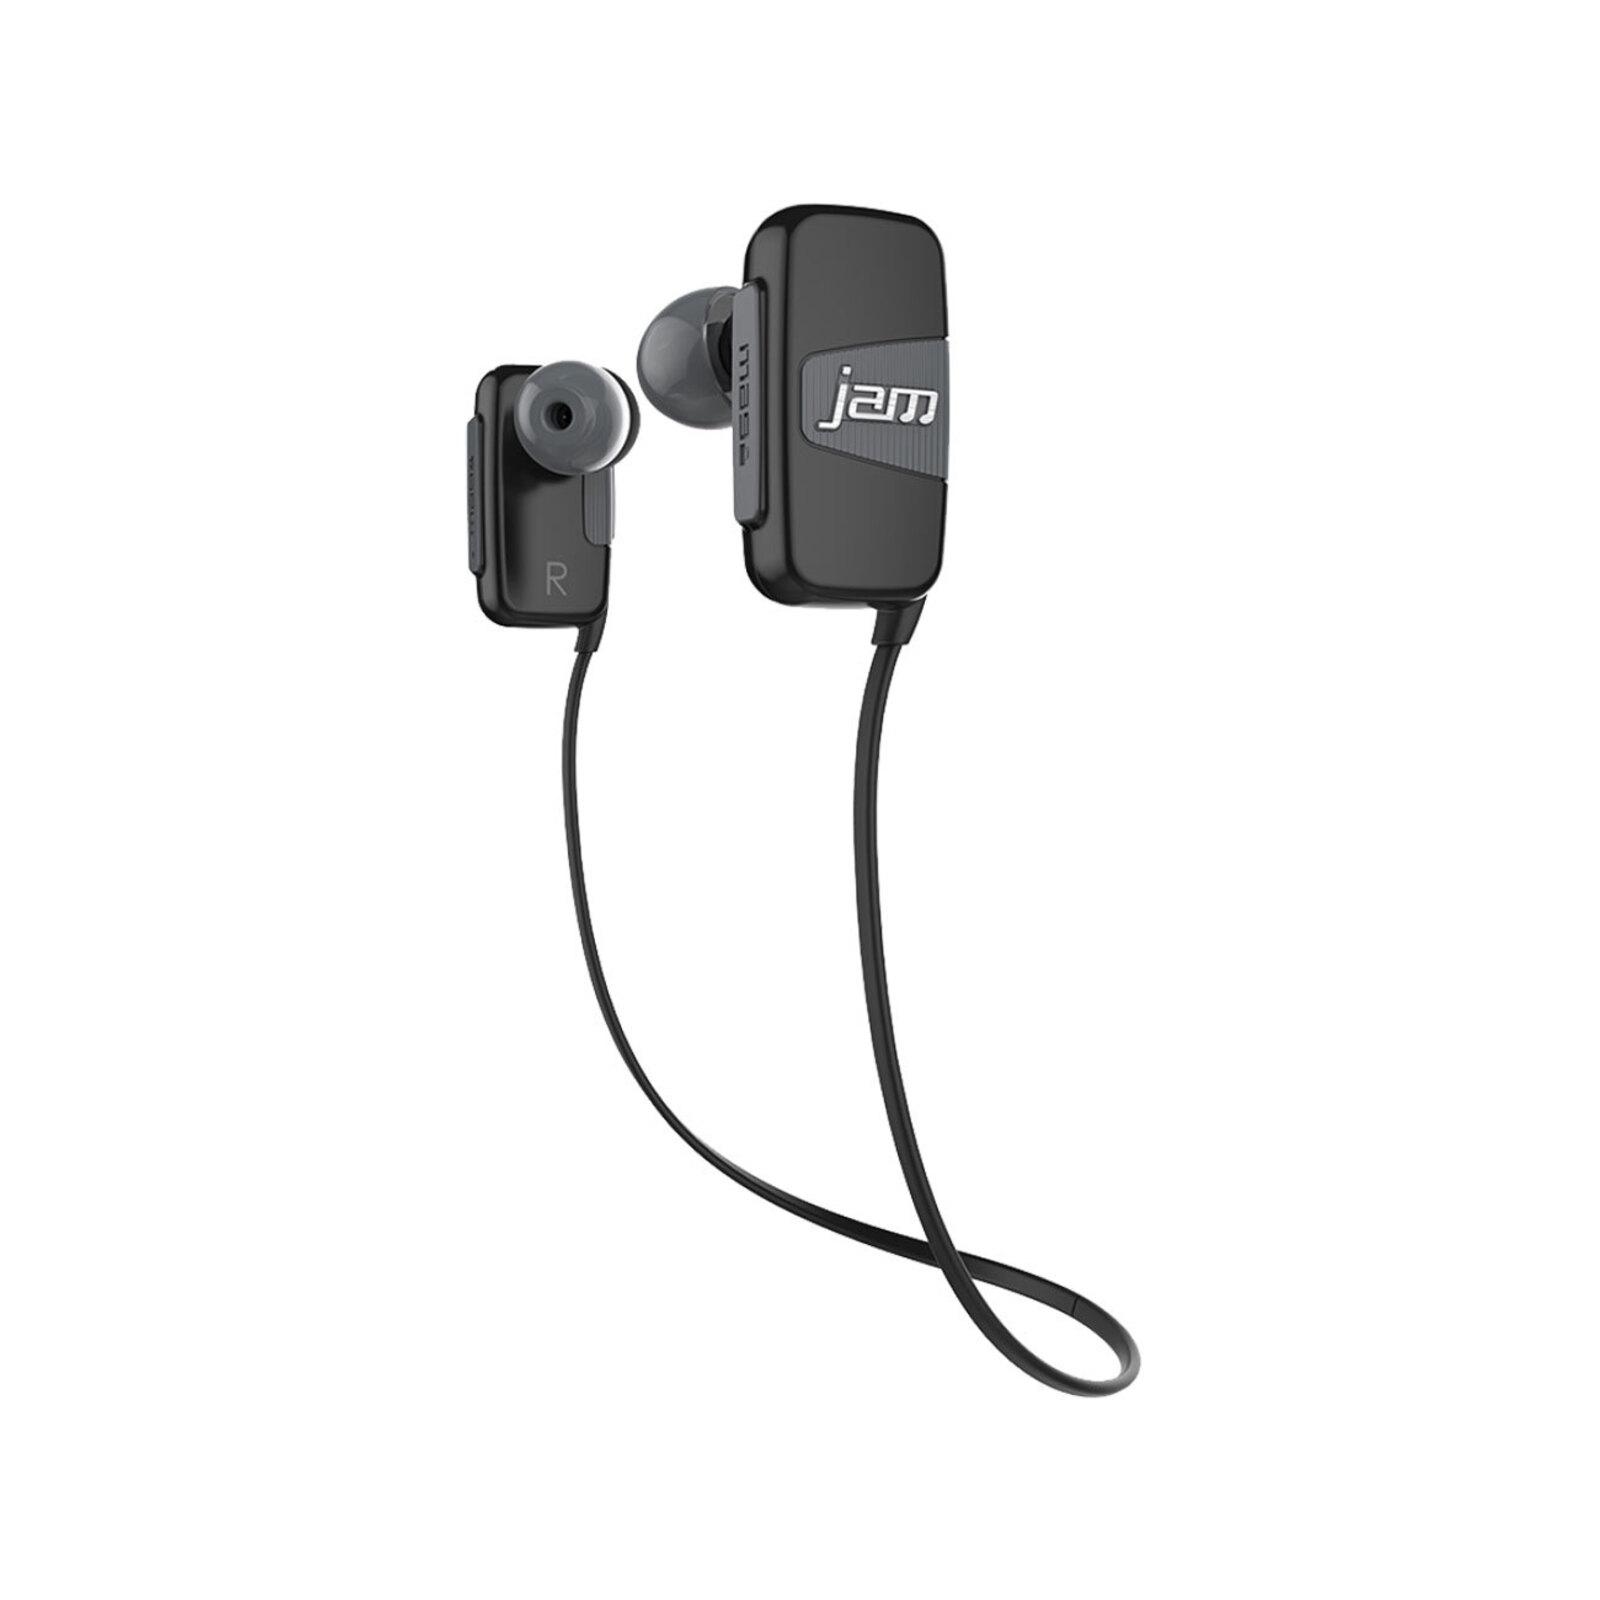 JAM Transit Mini Buds Bluetooth Sport Headset Wireless Earphones Sweatproof Grey